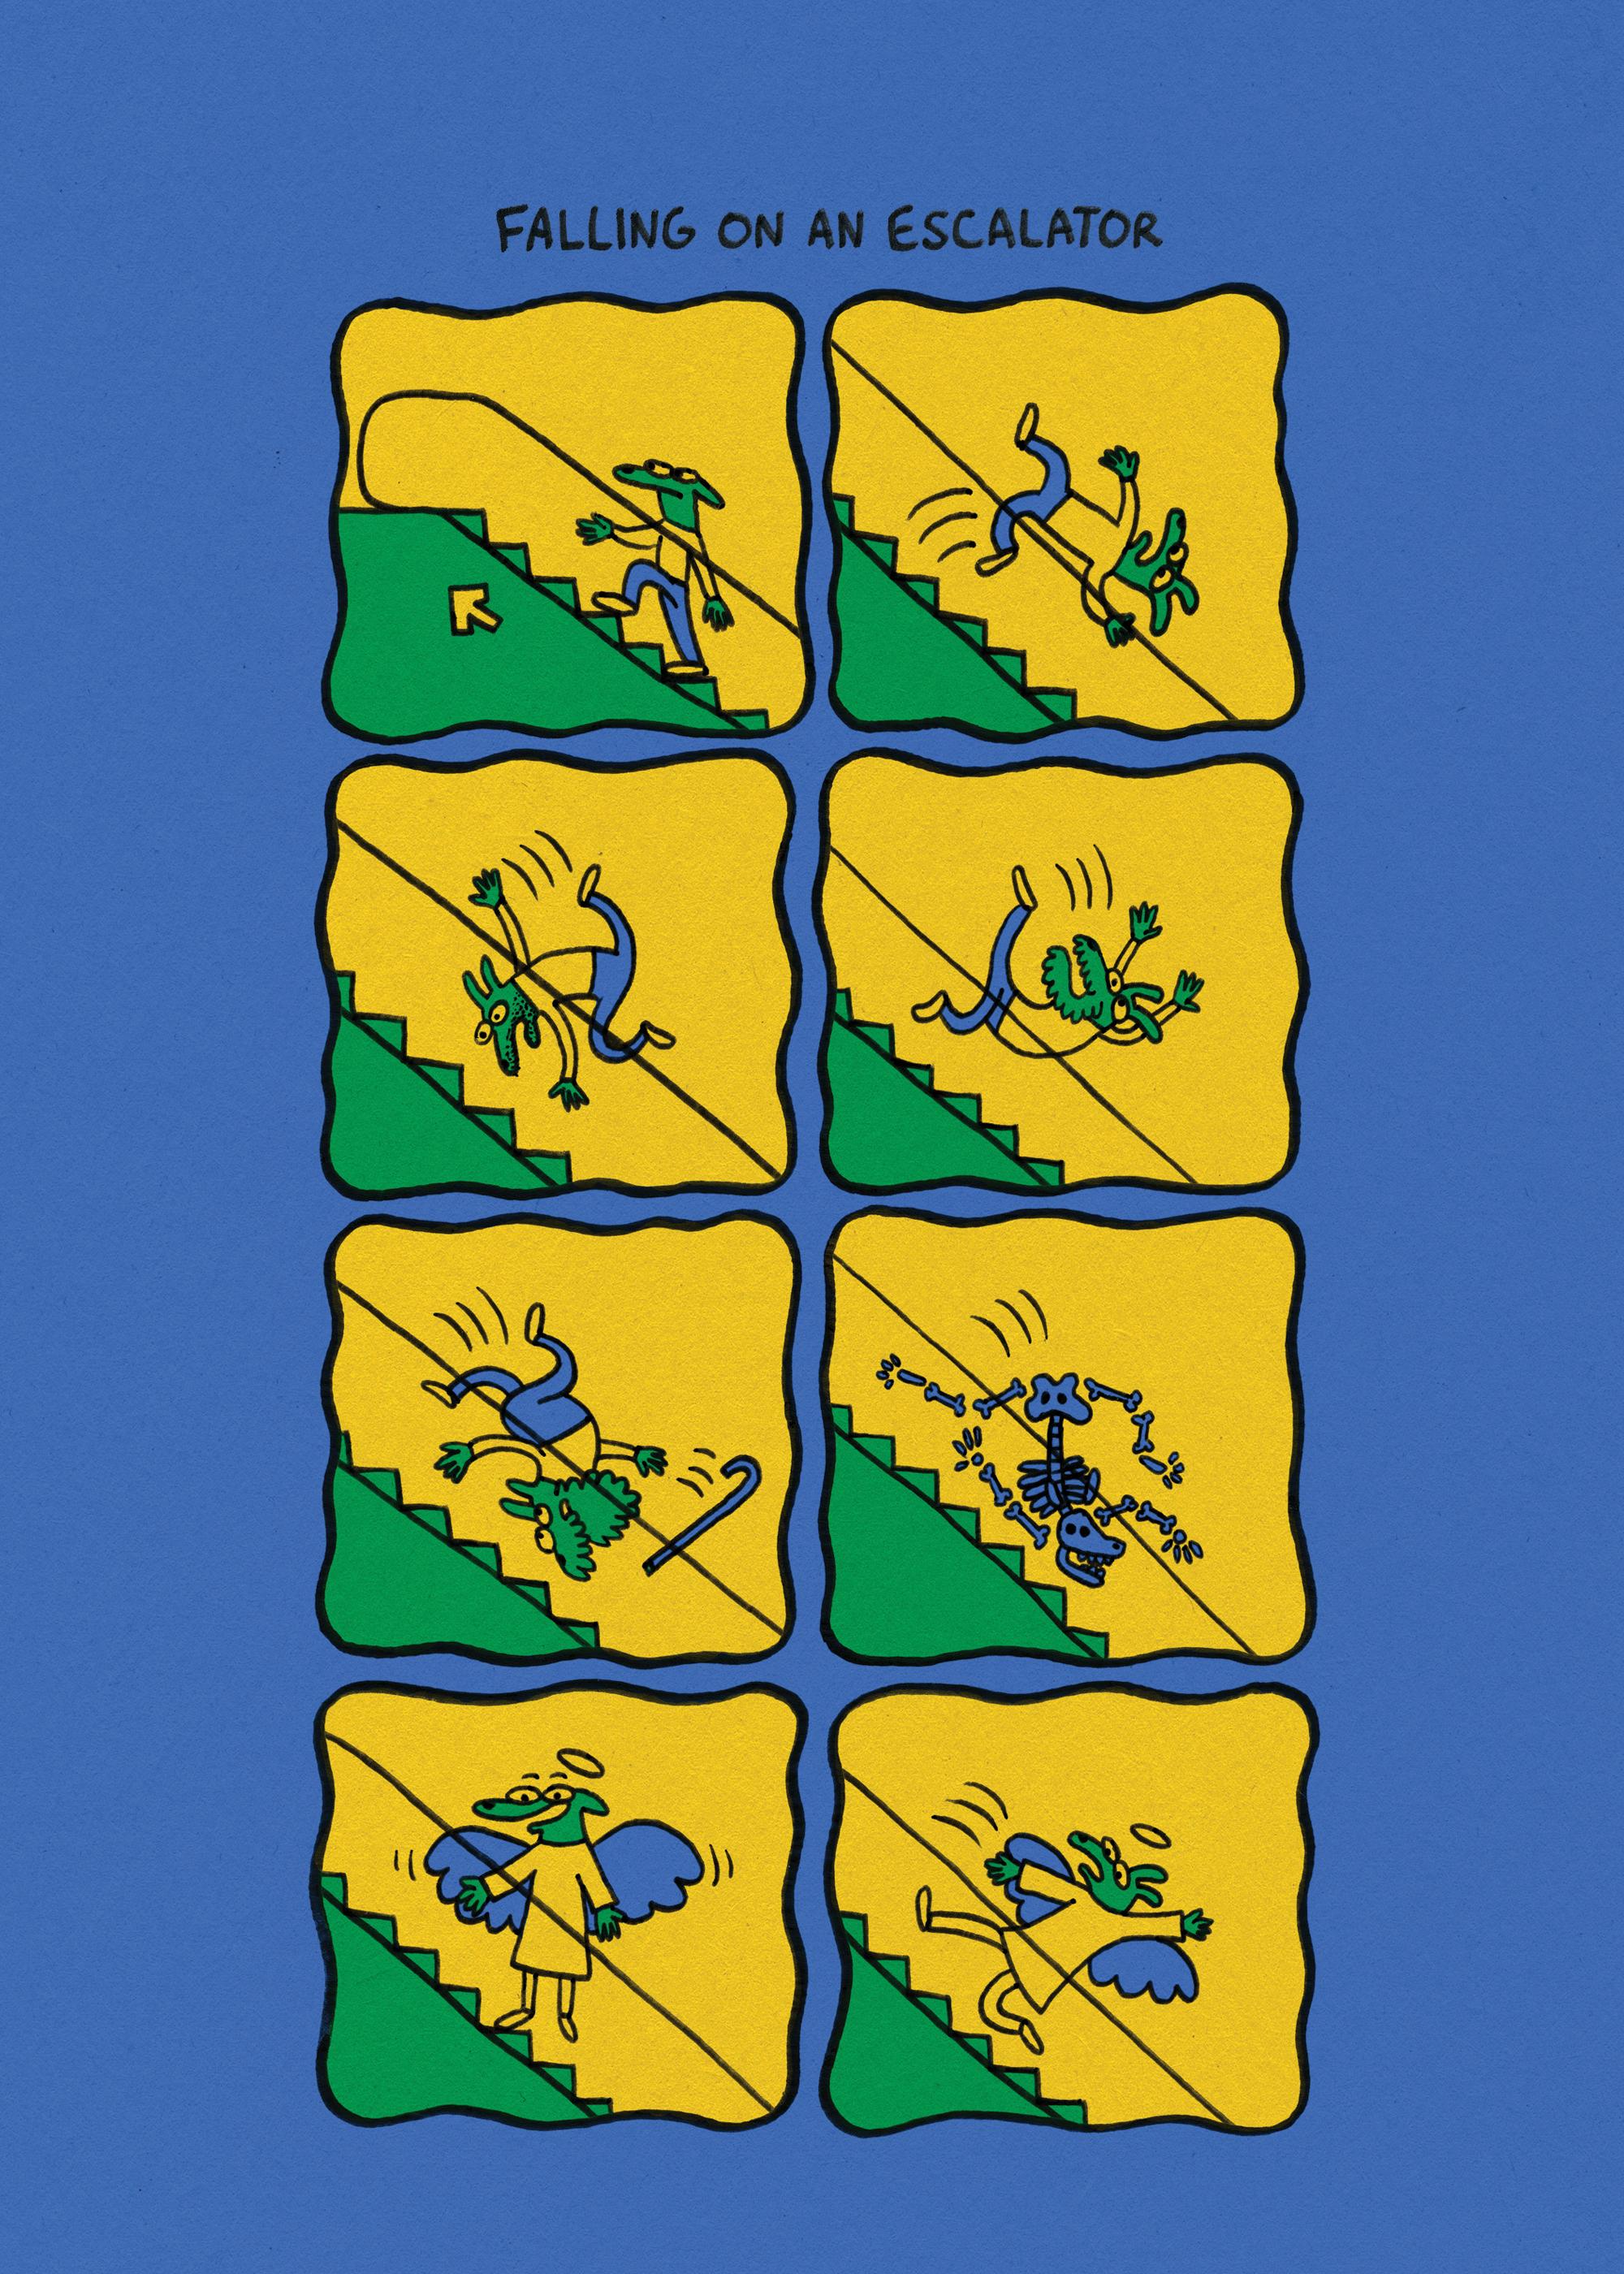 Escalator Comic.jpg